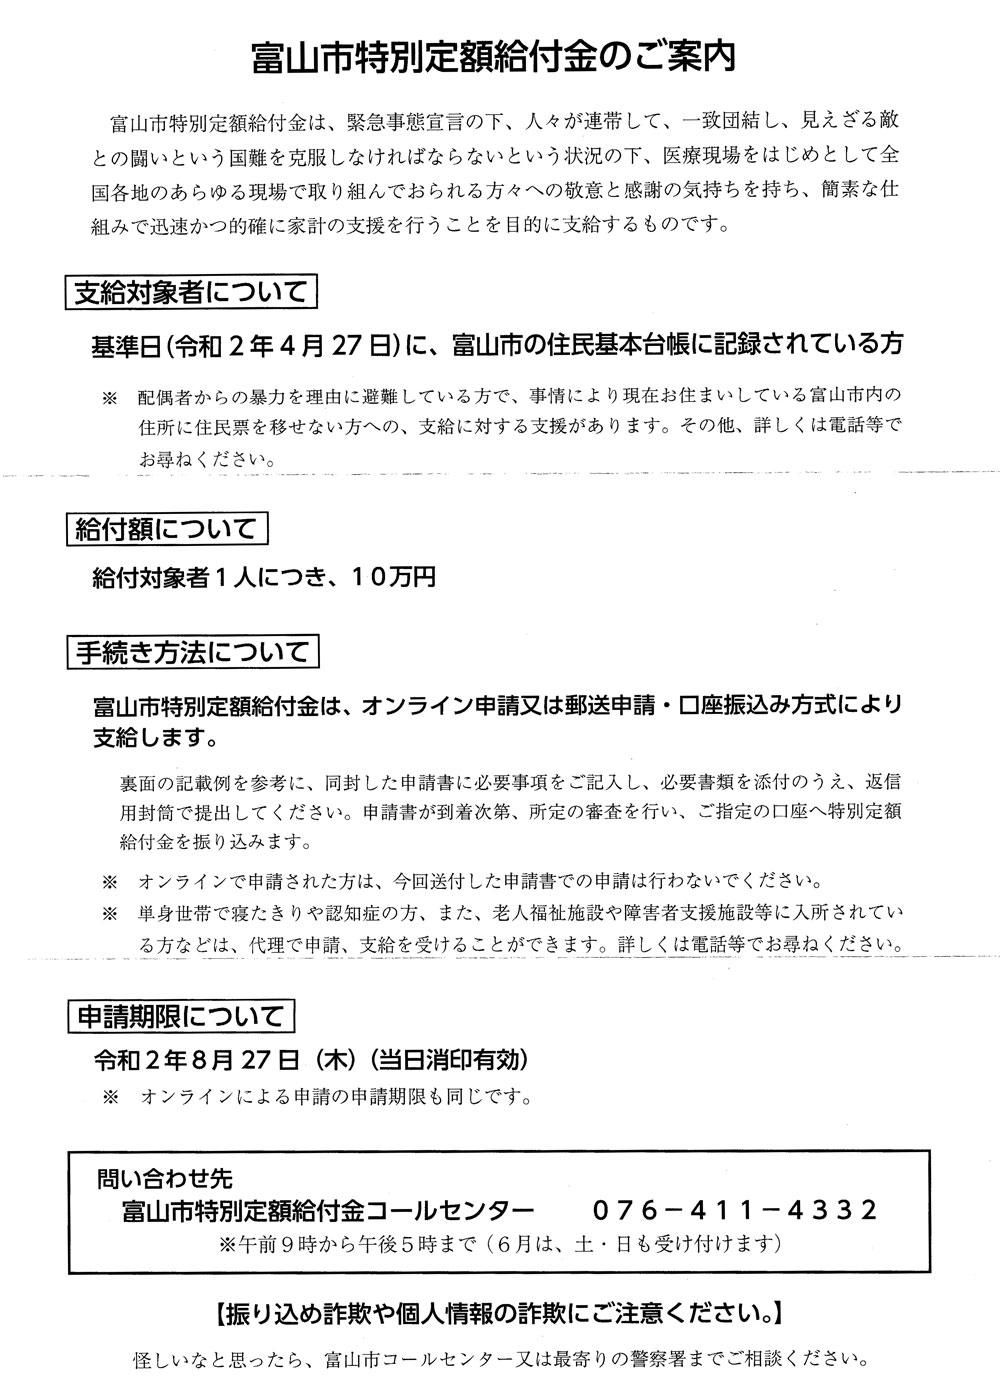 富山市の特別定額給付金の案内